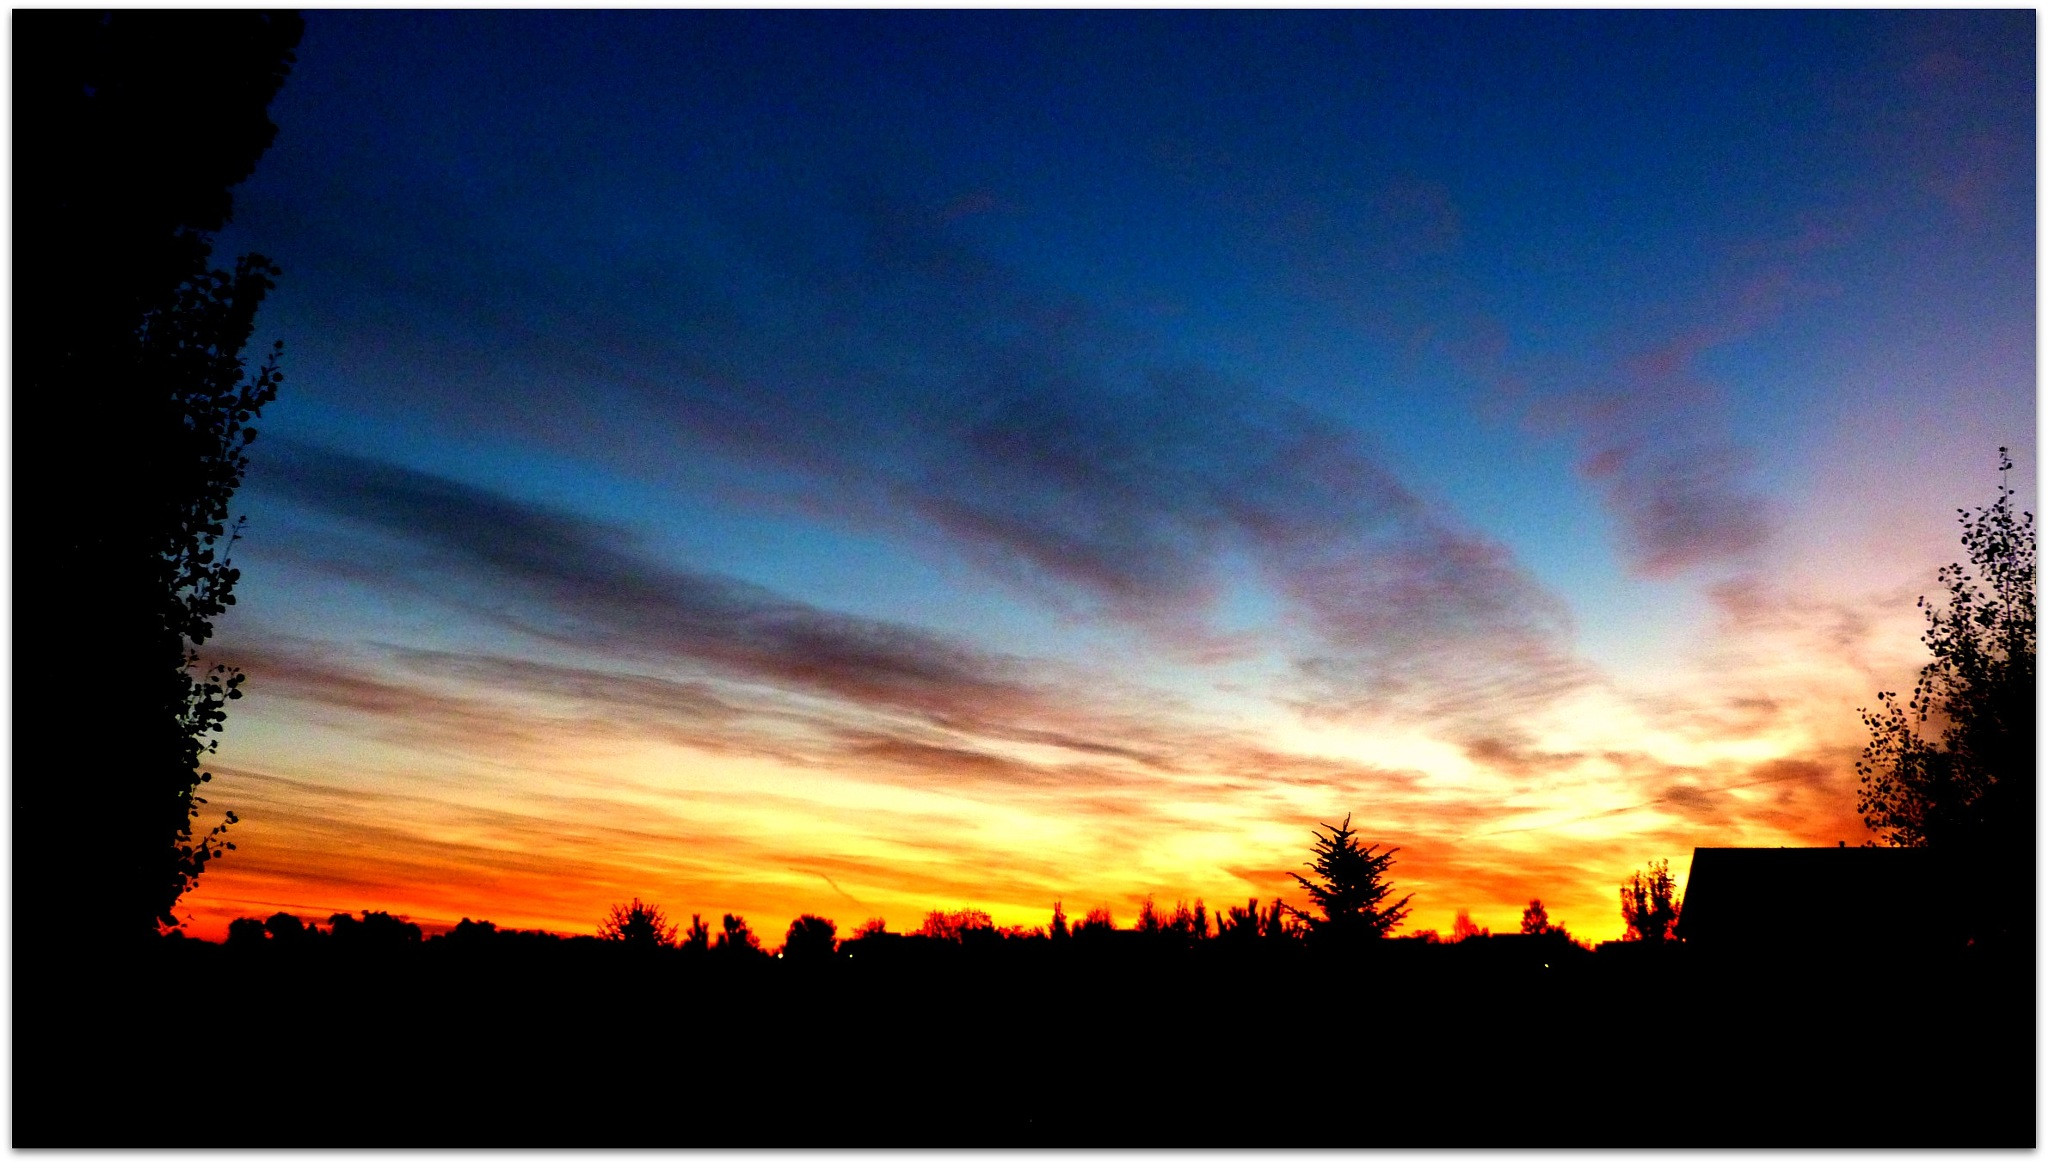 Morning sky by maria.telegdy